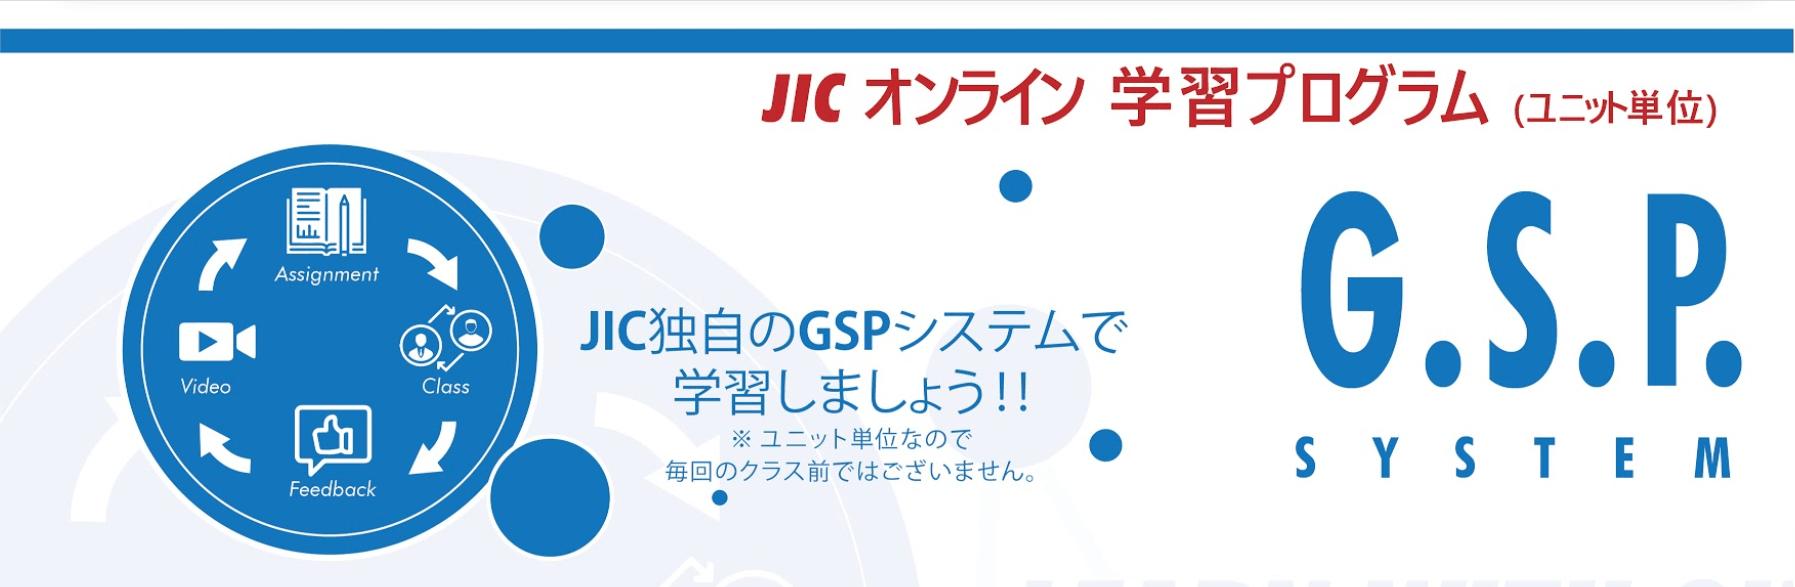 JICオンライン